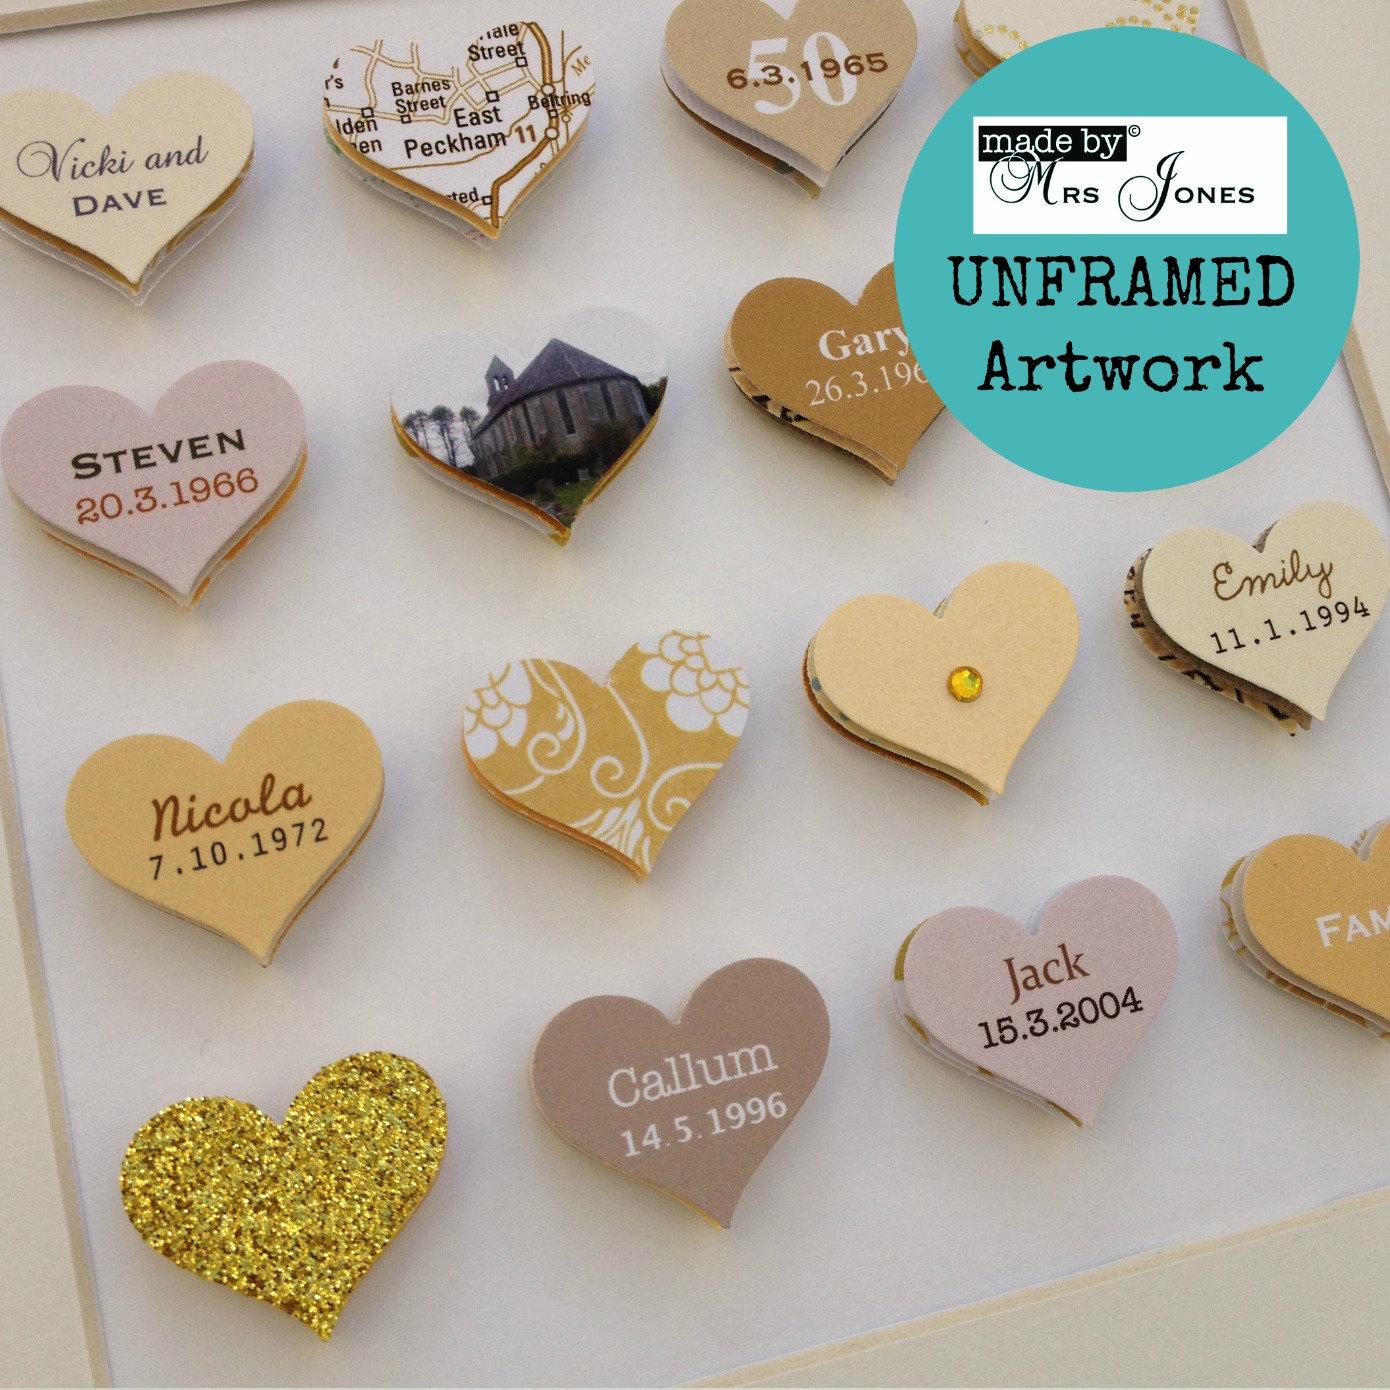 Golden Wedding Gift Ideas Uk: 50th Wedding Anniversary Gift 16 Small Hearts Golden